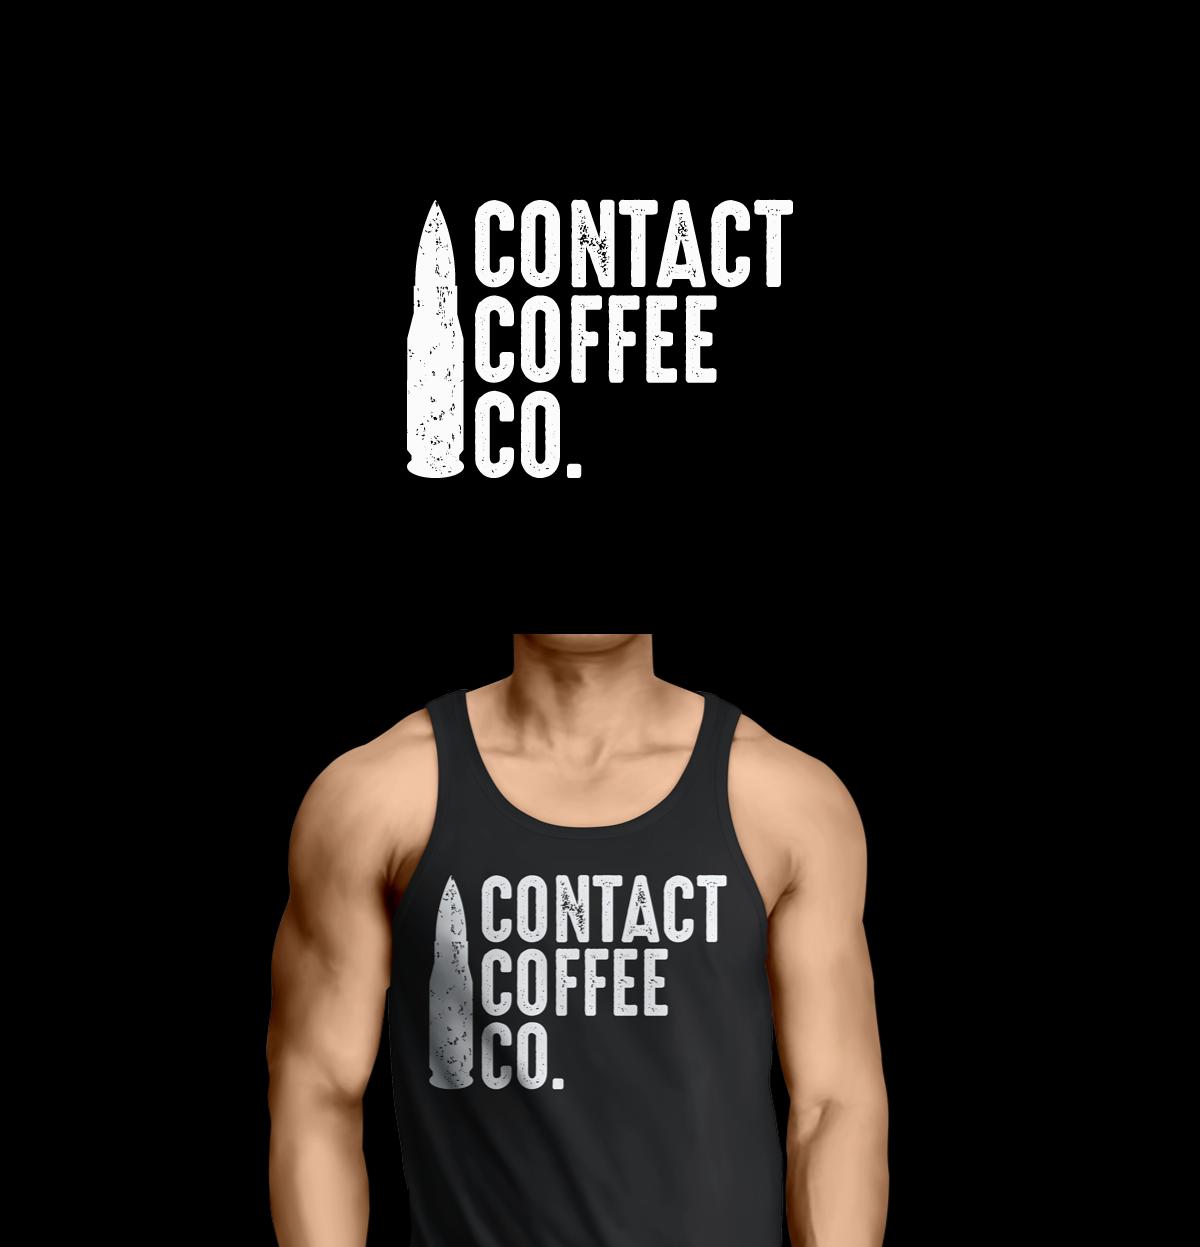 Military coffee company needs a modern logo